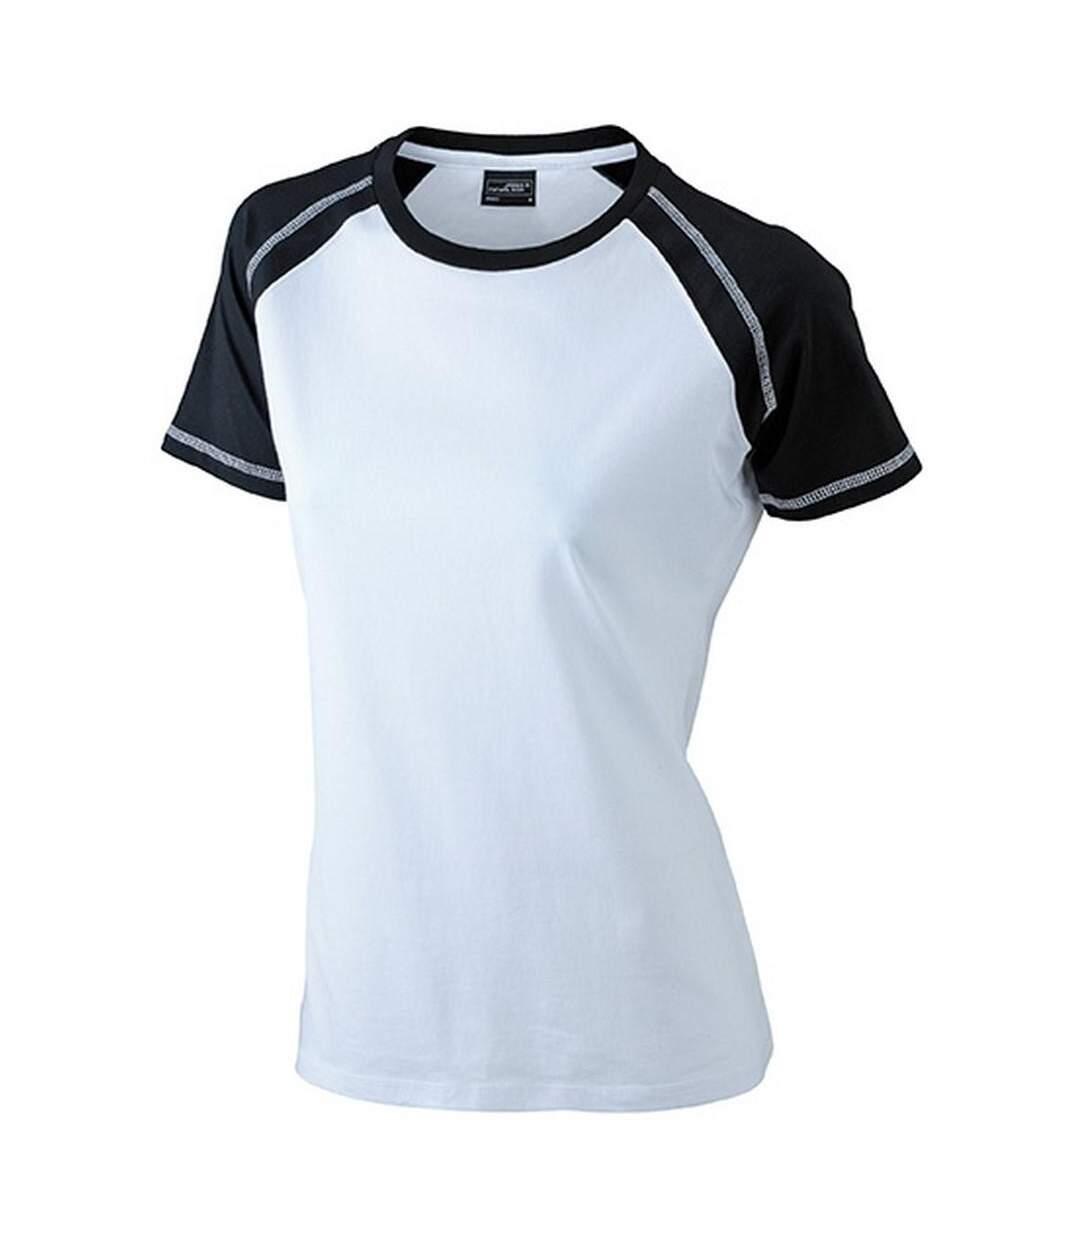 James And Nicholson - T-Shirt Bicolore - Femme (Blanc / noir) - UTFU366